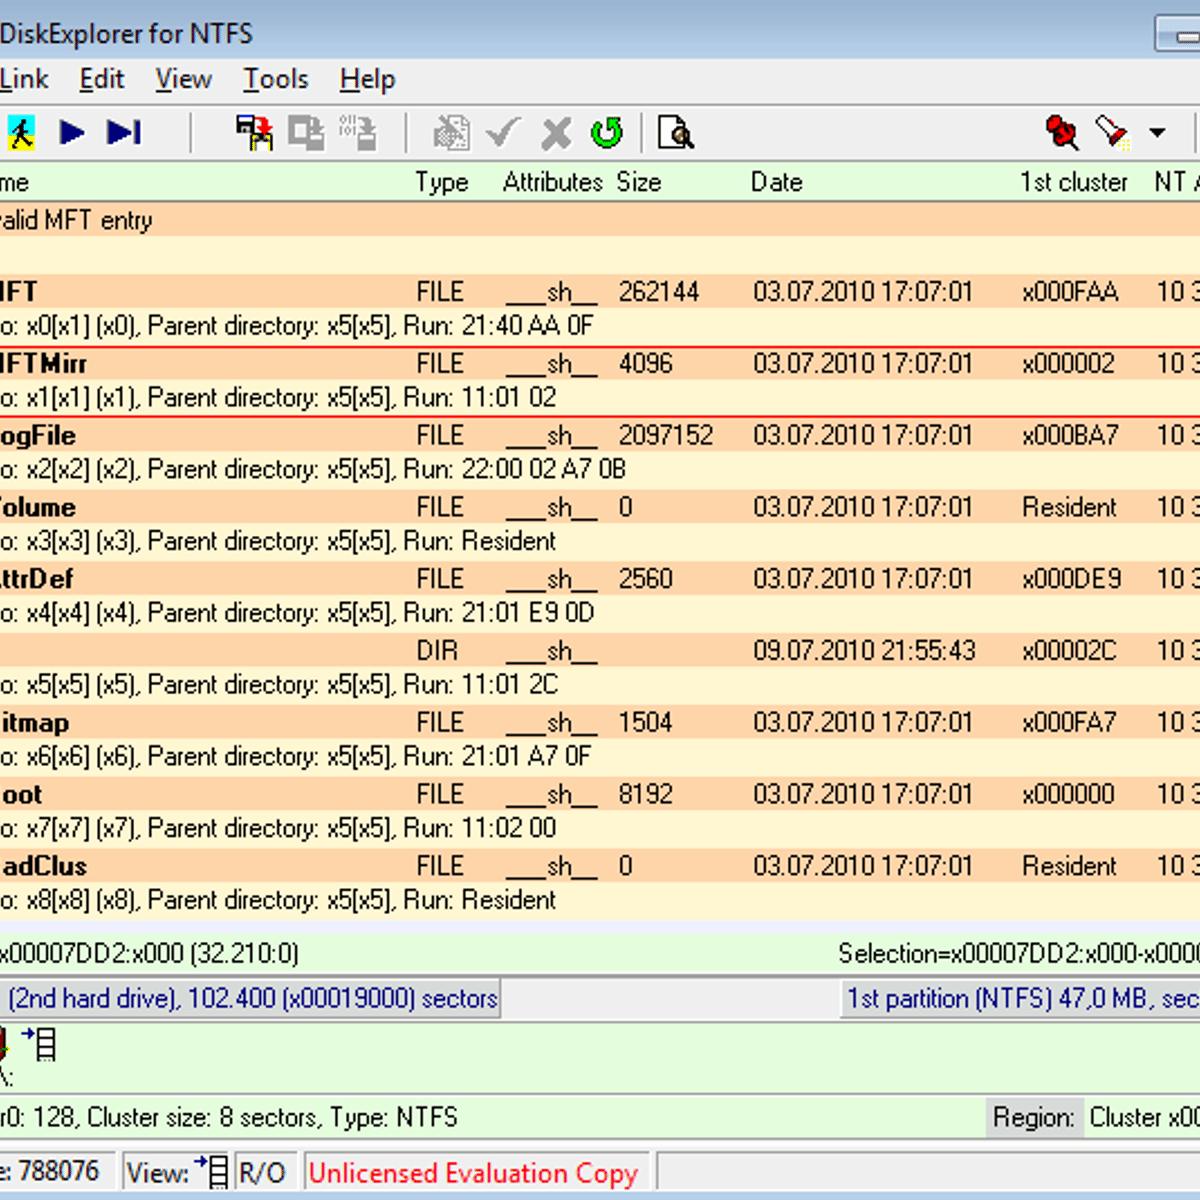 DiskExplorer Alternatives and Similar Software